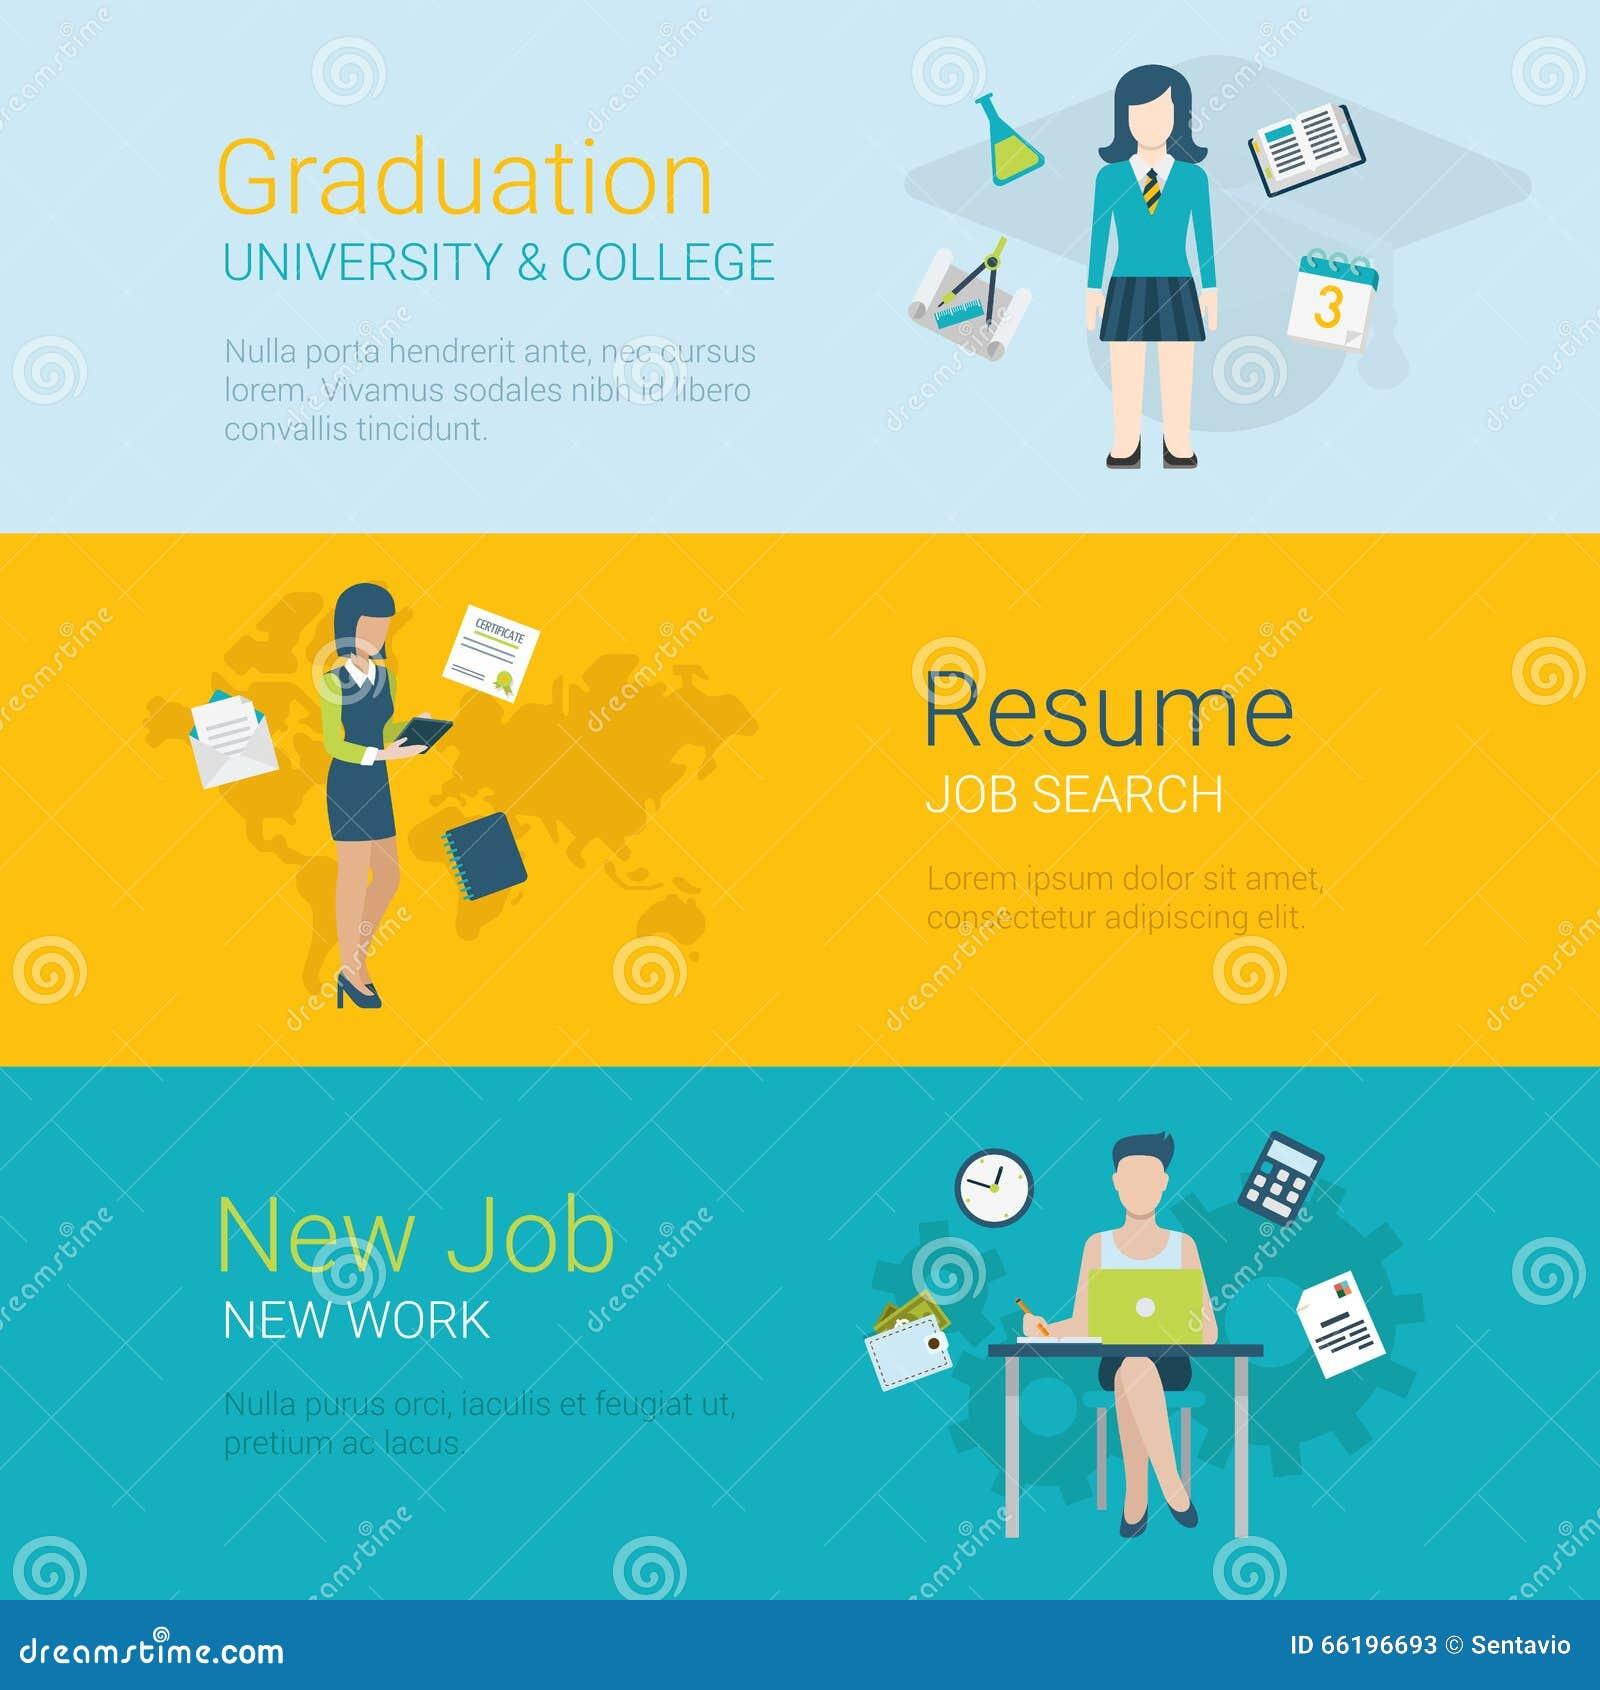 Flat Vector Website Slider Banner Career Graduation University Stock Vector Illustration Of Banner Concept 66196693